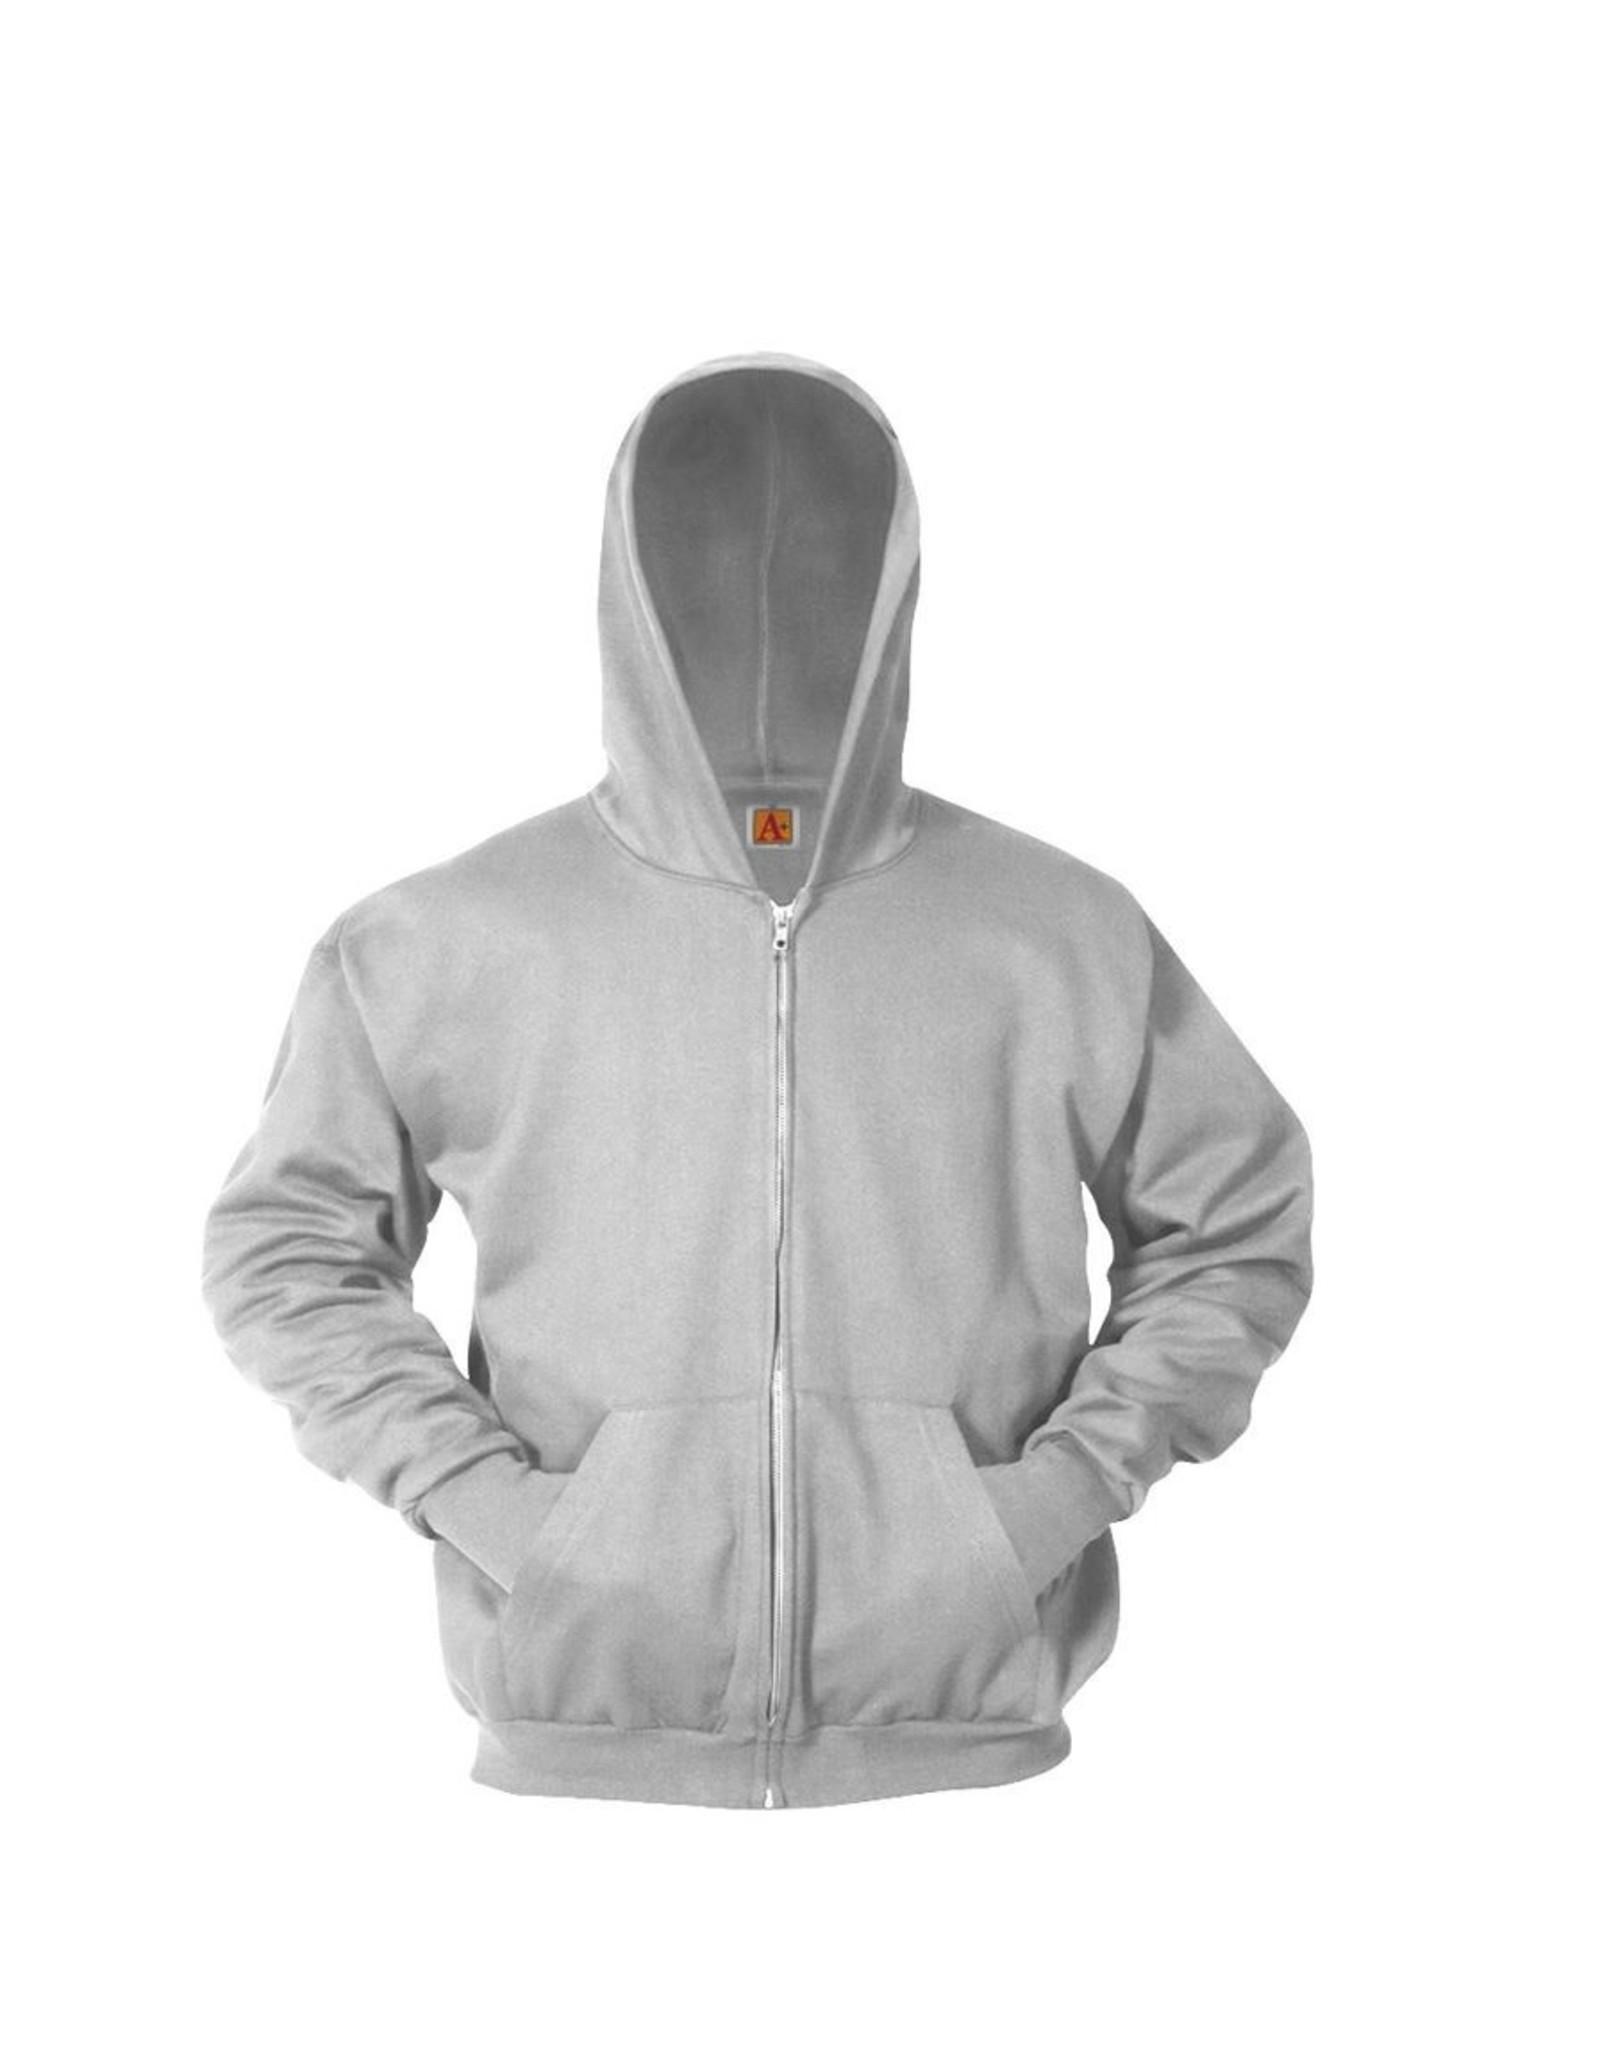 NON-UNIFORM Sweatshirt - Hooded Unisex Full Zip - Custom Order, youth & adult sizes